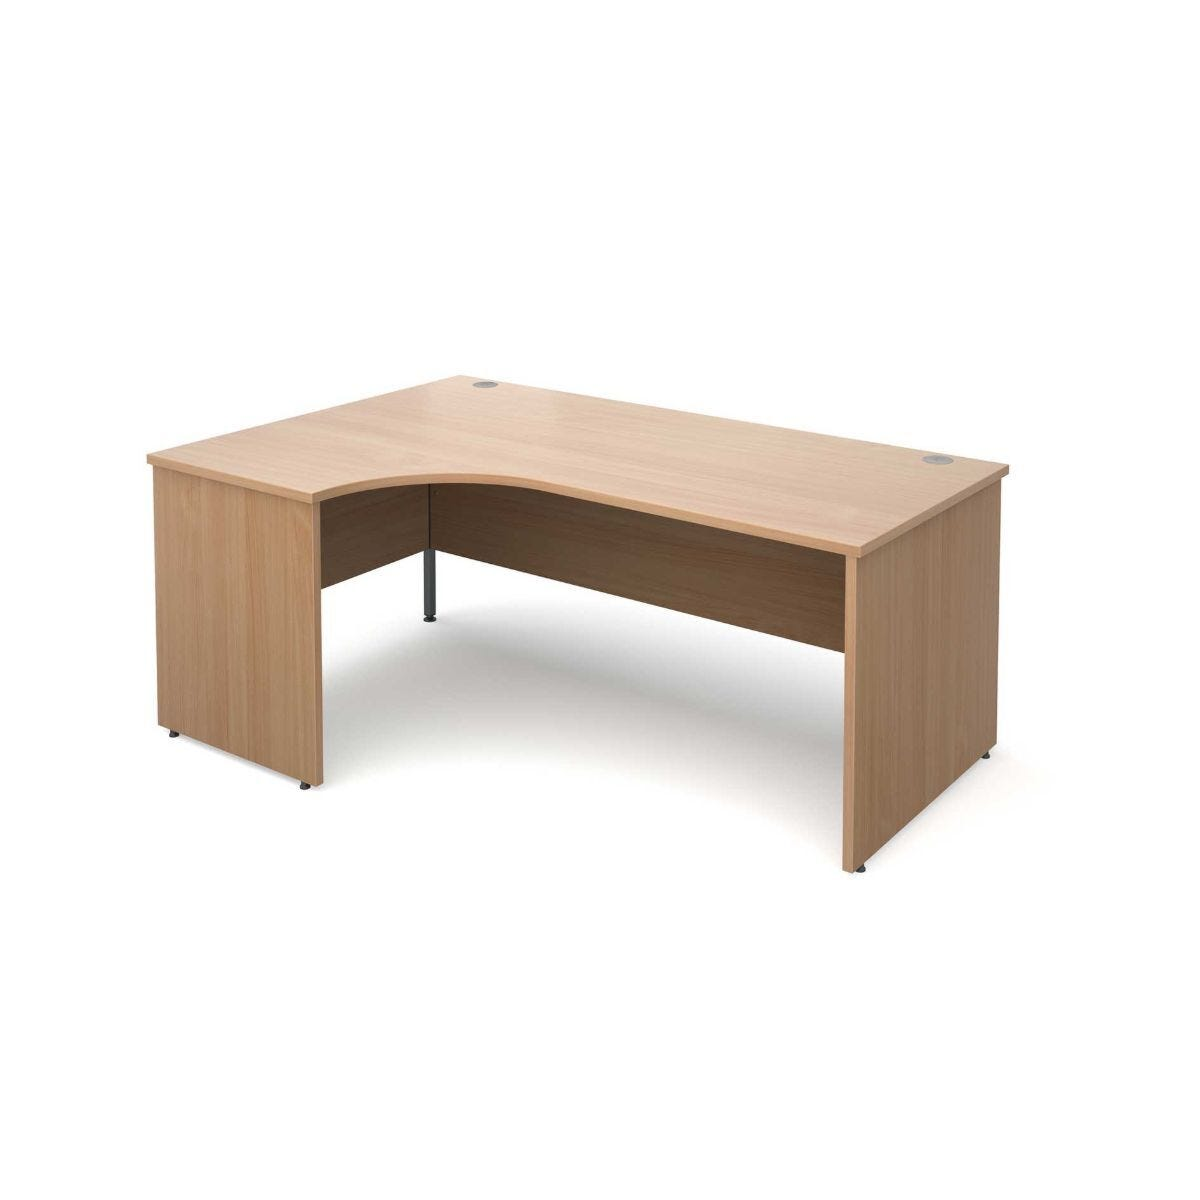 Maestro 25 Left Hand Ergonomic 1800 Desk with End Panel Beech